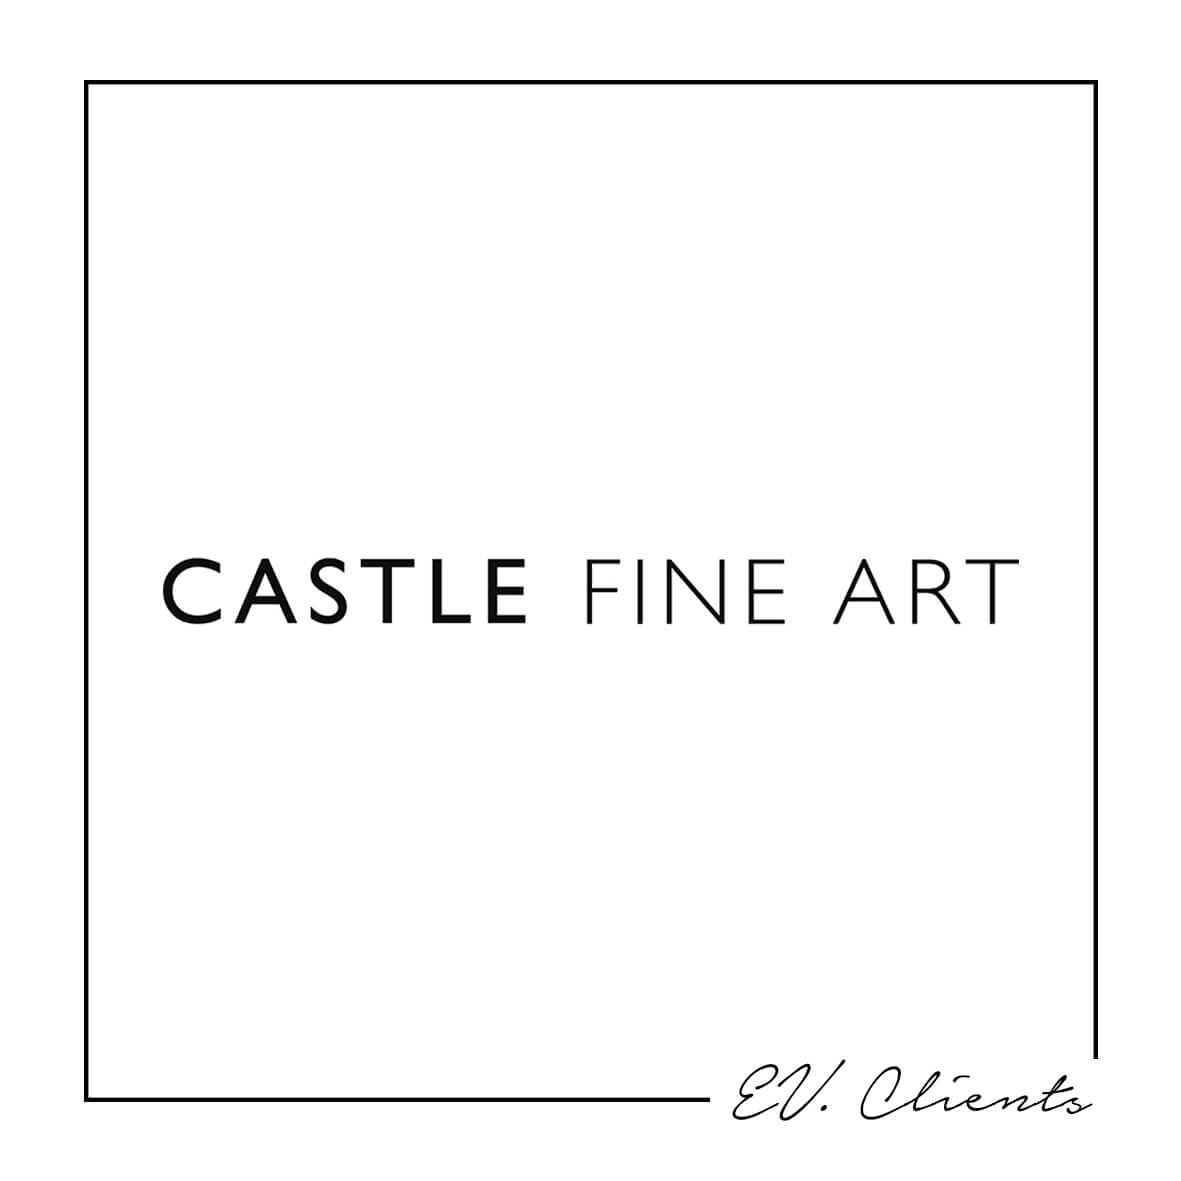 Castle Fine Art Mailbox